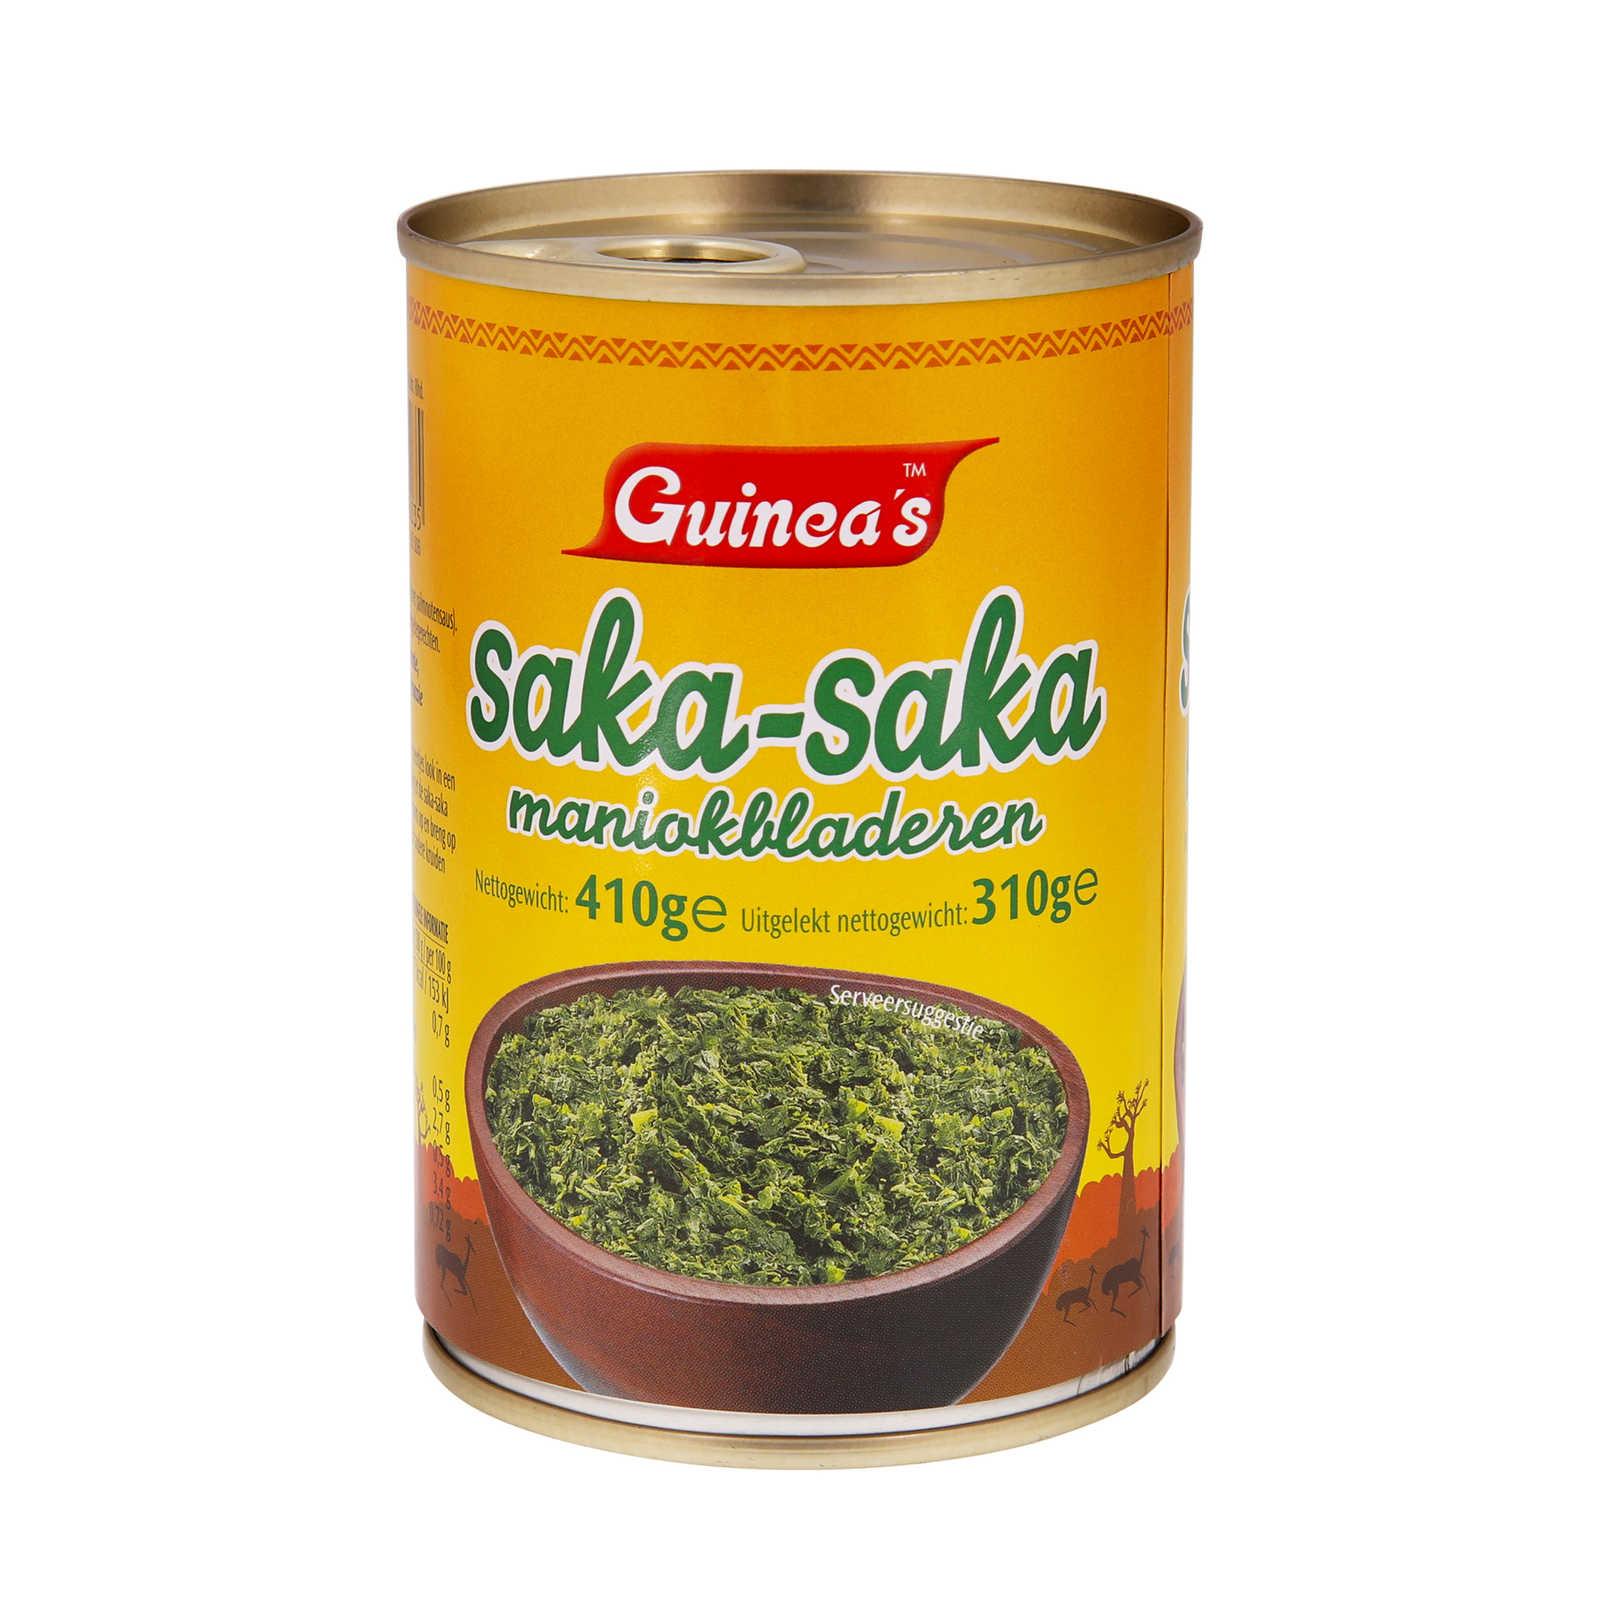 Guinea's